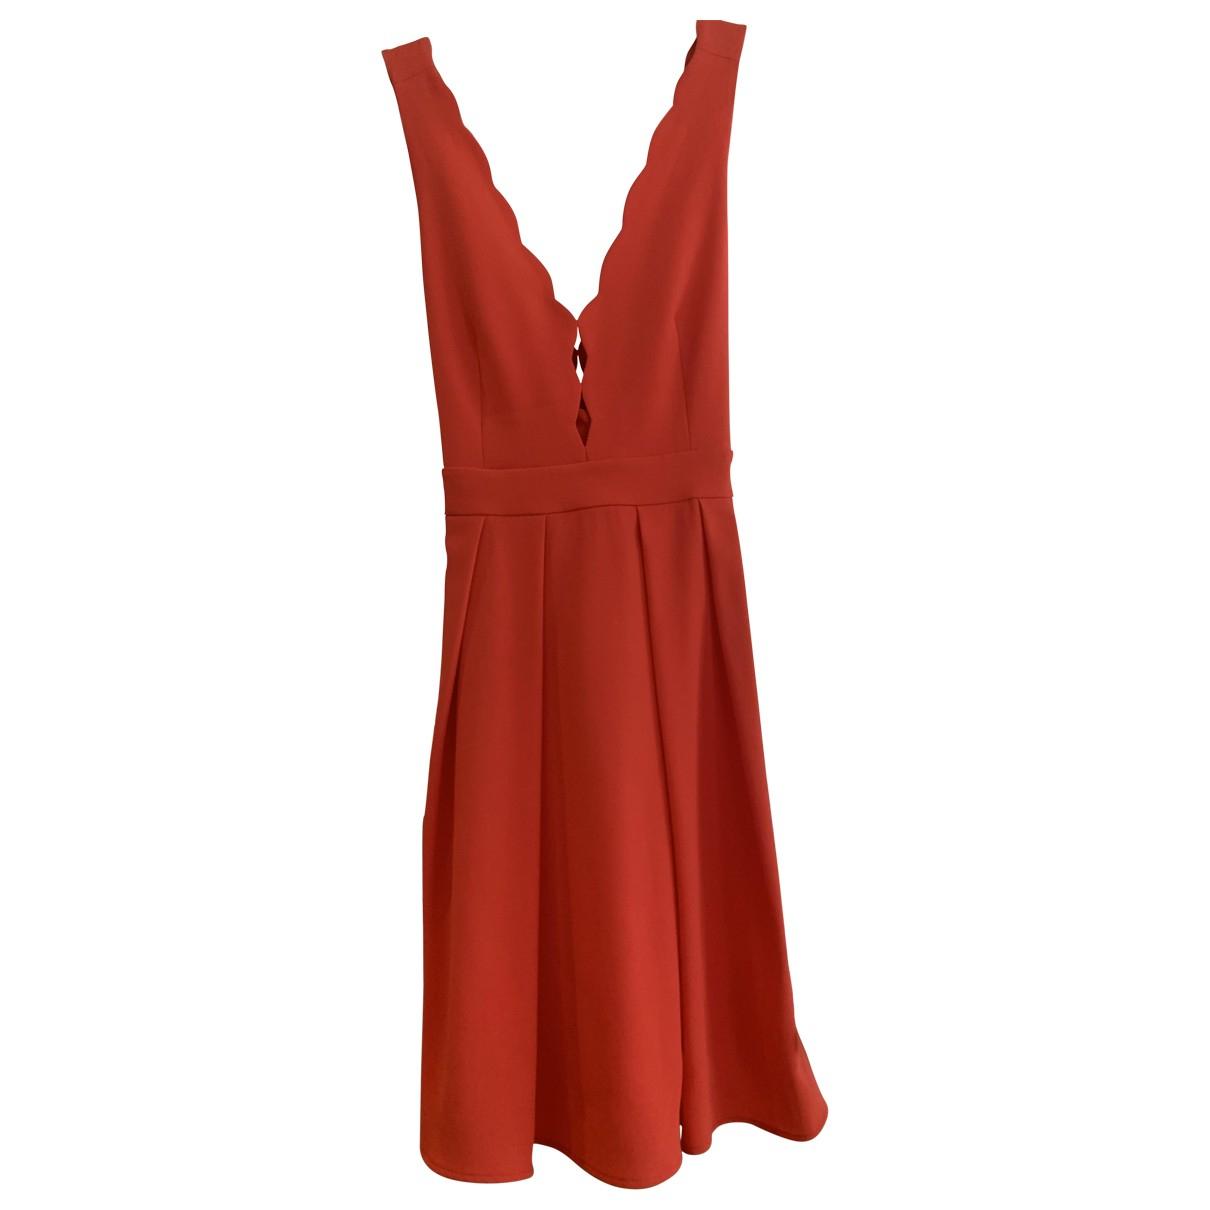 Claudie Pierlot N Pink dress for Women 36 FR